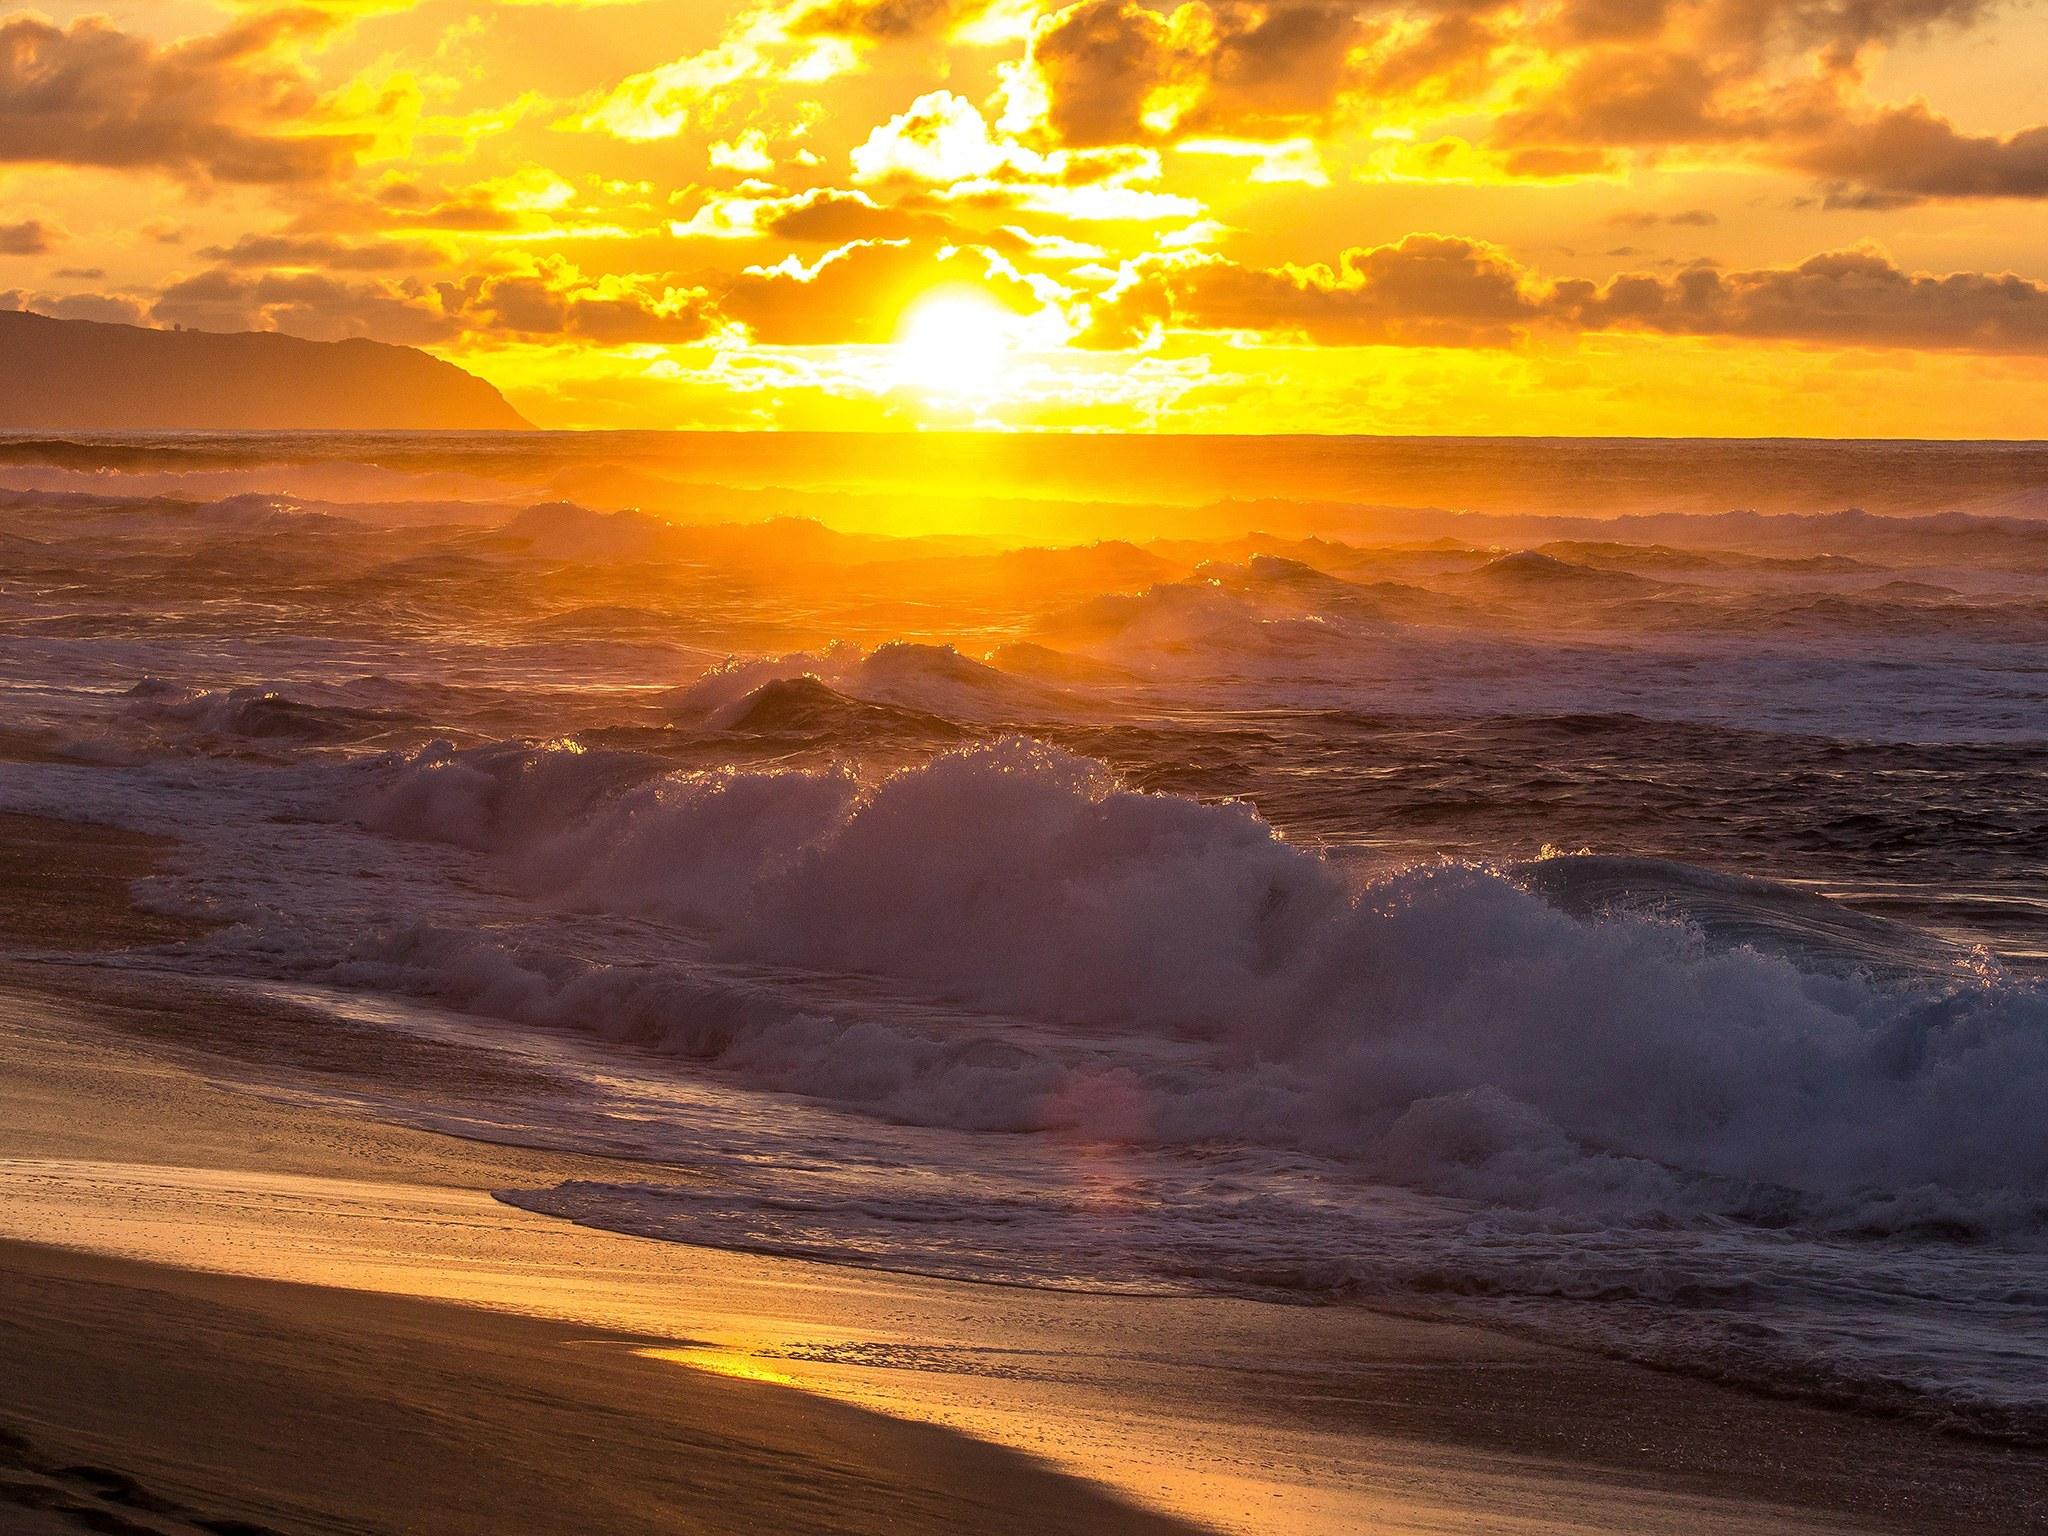 sunset-beach-_hawaii_havasi_dorka_blog.jpg